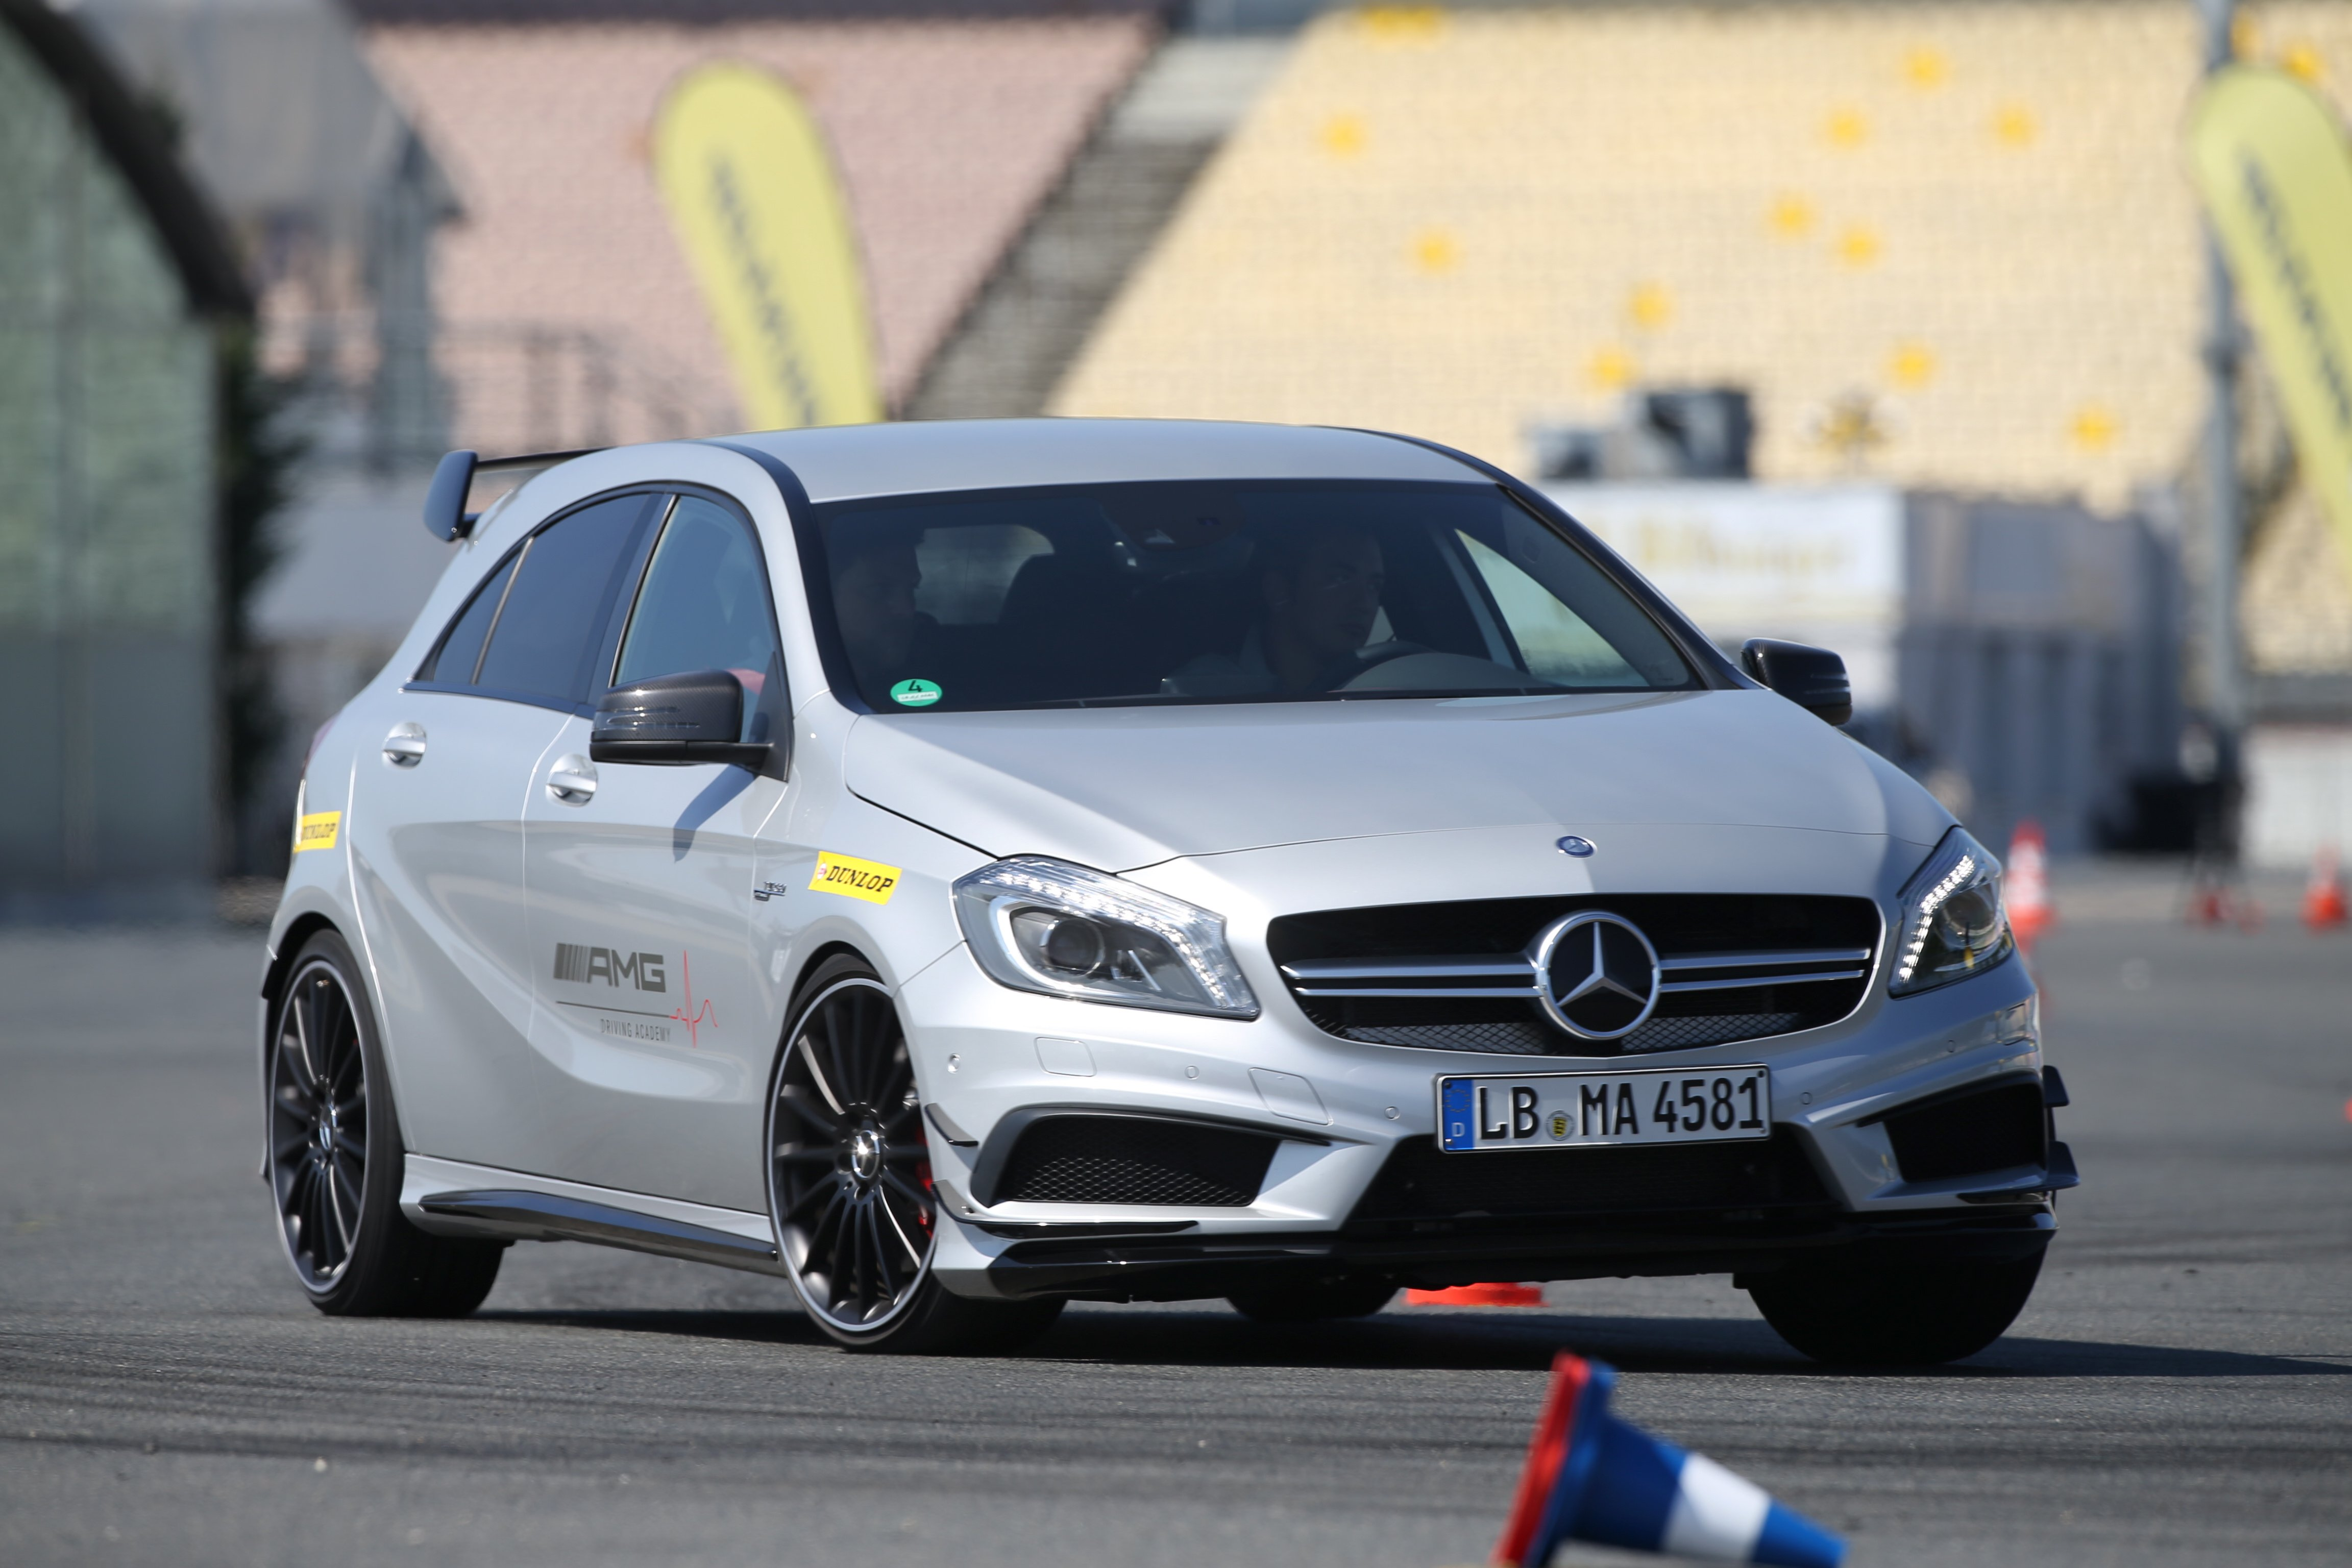 Dunlop x AMG Driving Academy